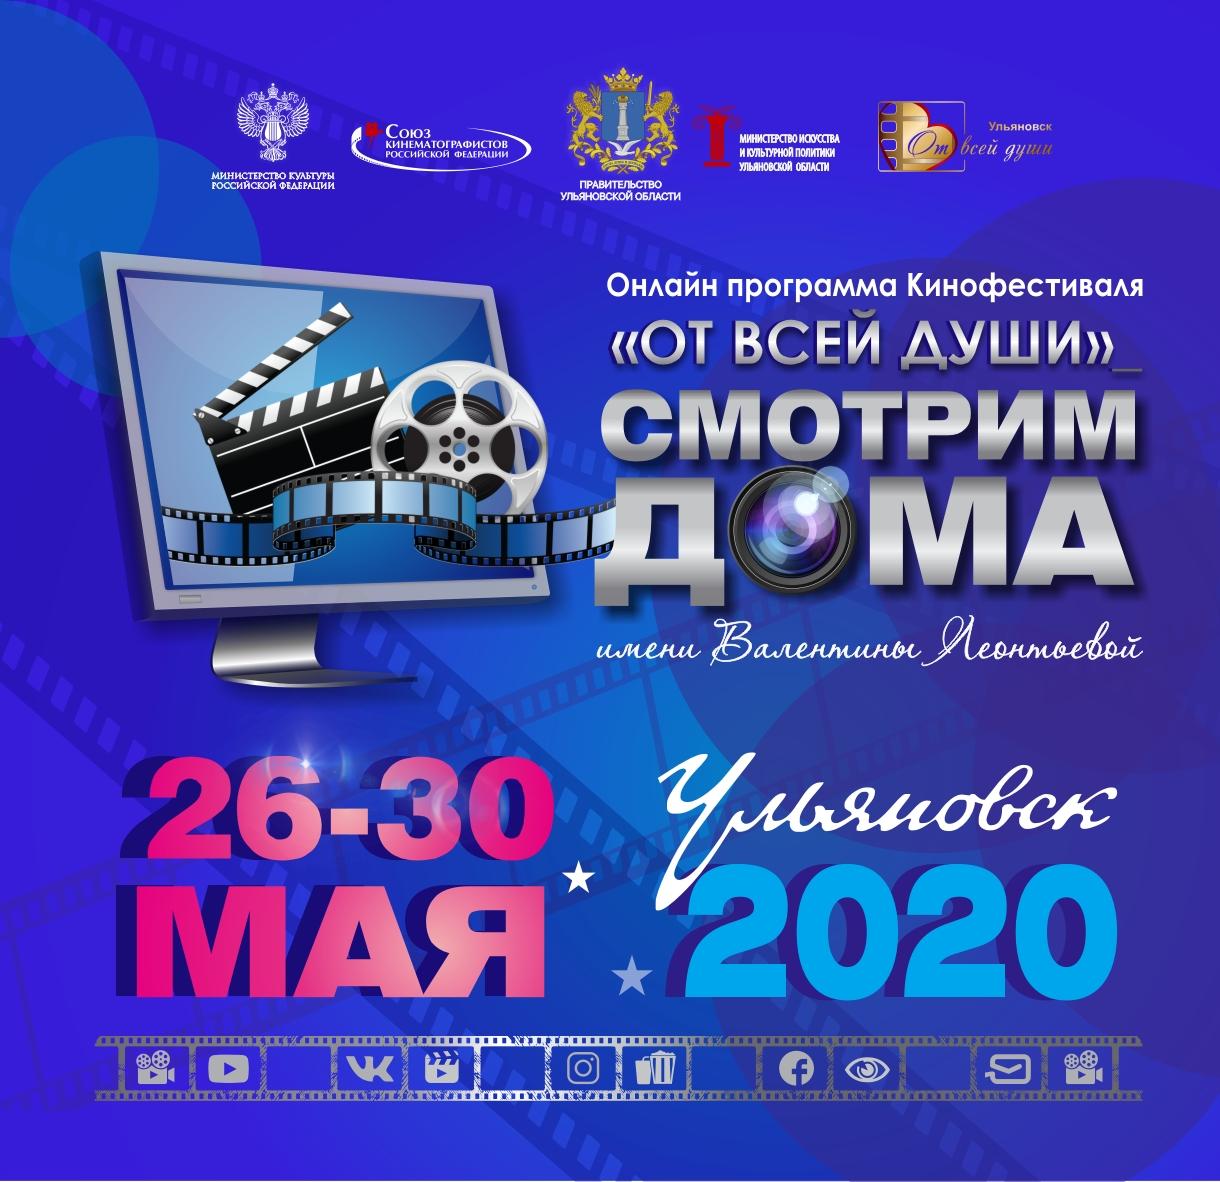 Онлайн-программа Международного кинофестиваля «От всей души» «Смотрим дома»